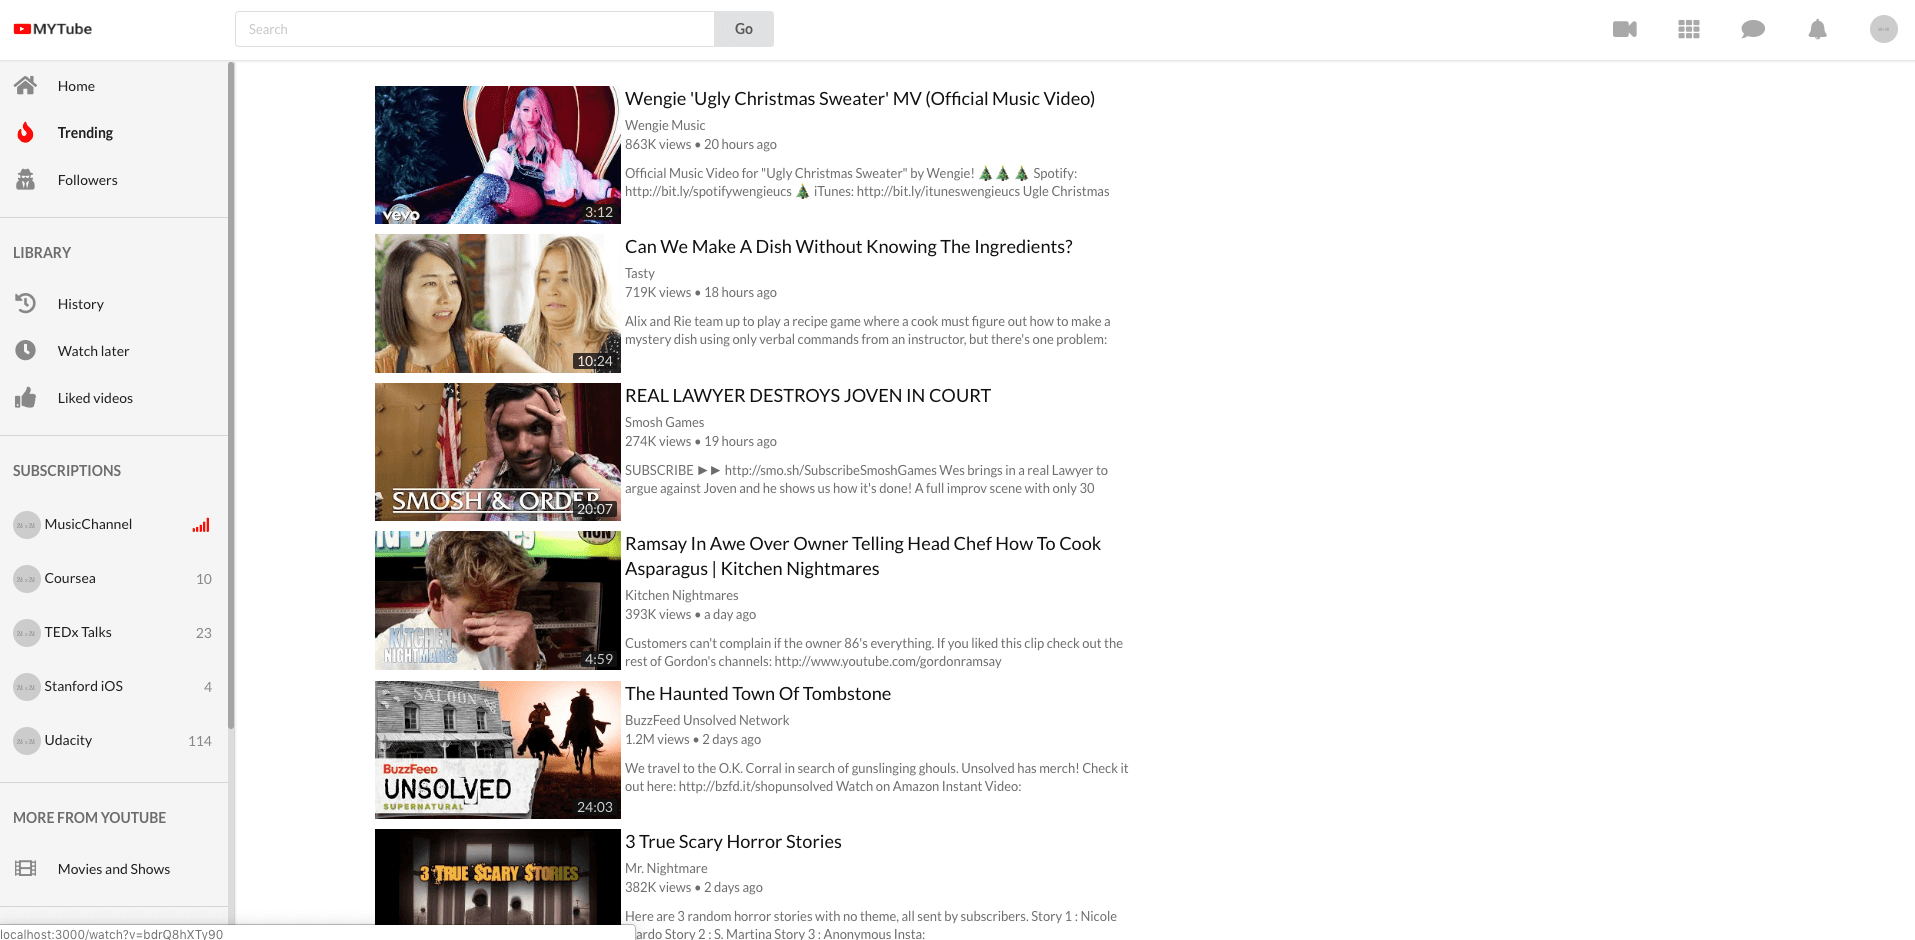 Build Youtube in React 42: infinite scroll for trending videos